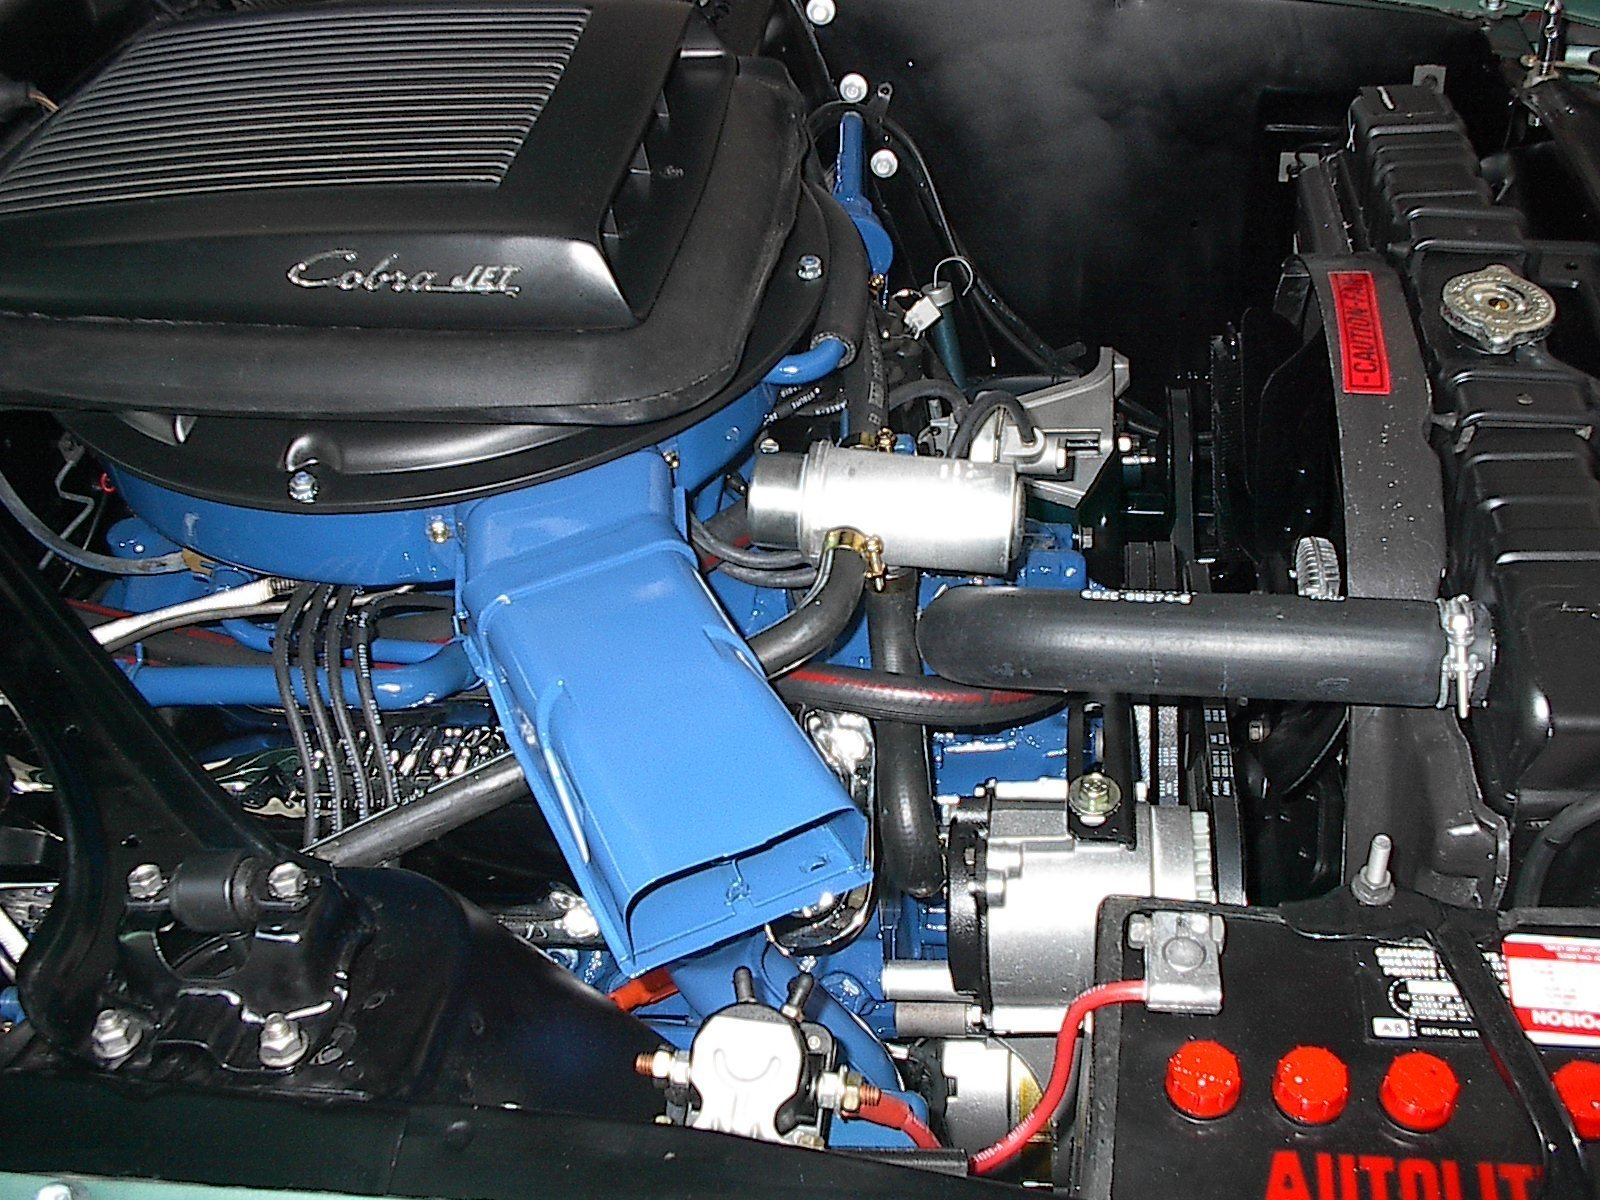 1969 Ford Mustang 428 Cobra Jet R Code For Sale 68465 Mcg Mach 1 Fastback Cj